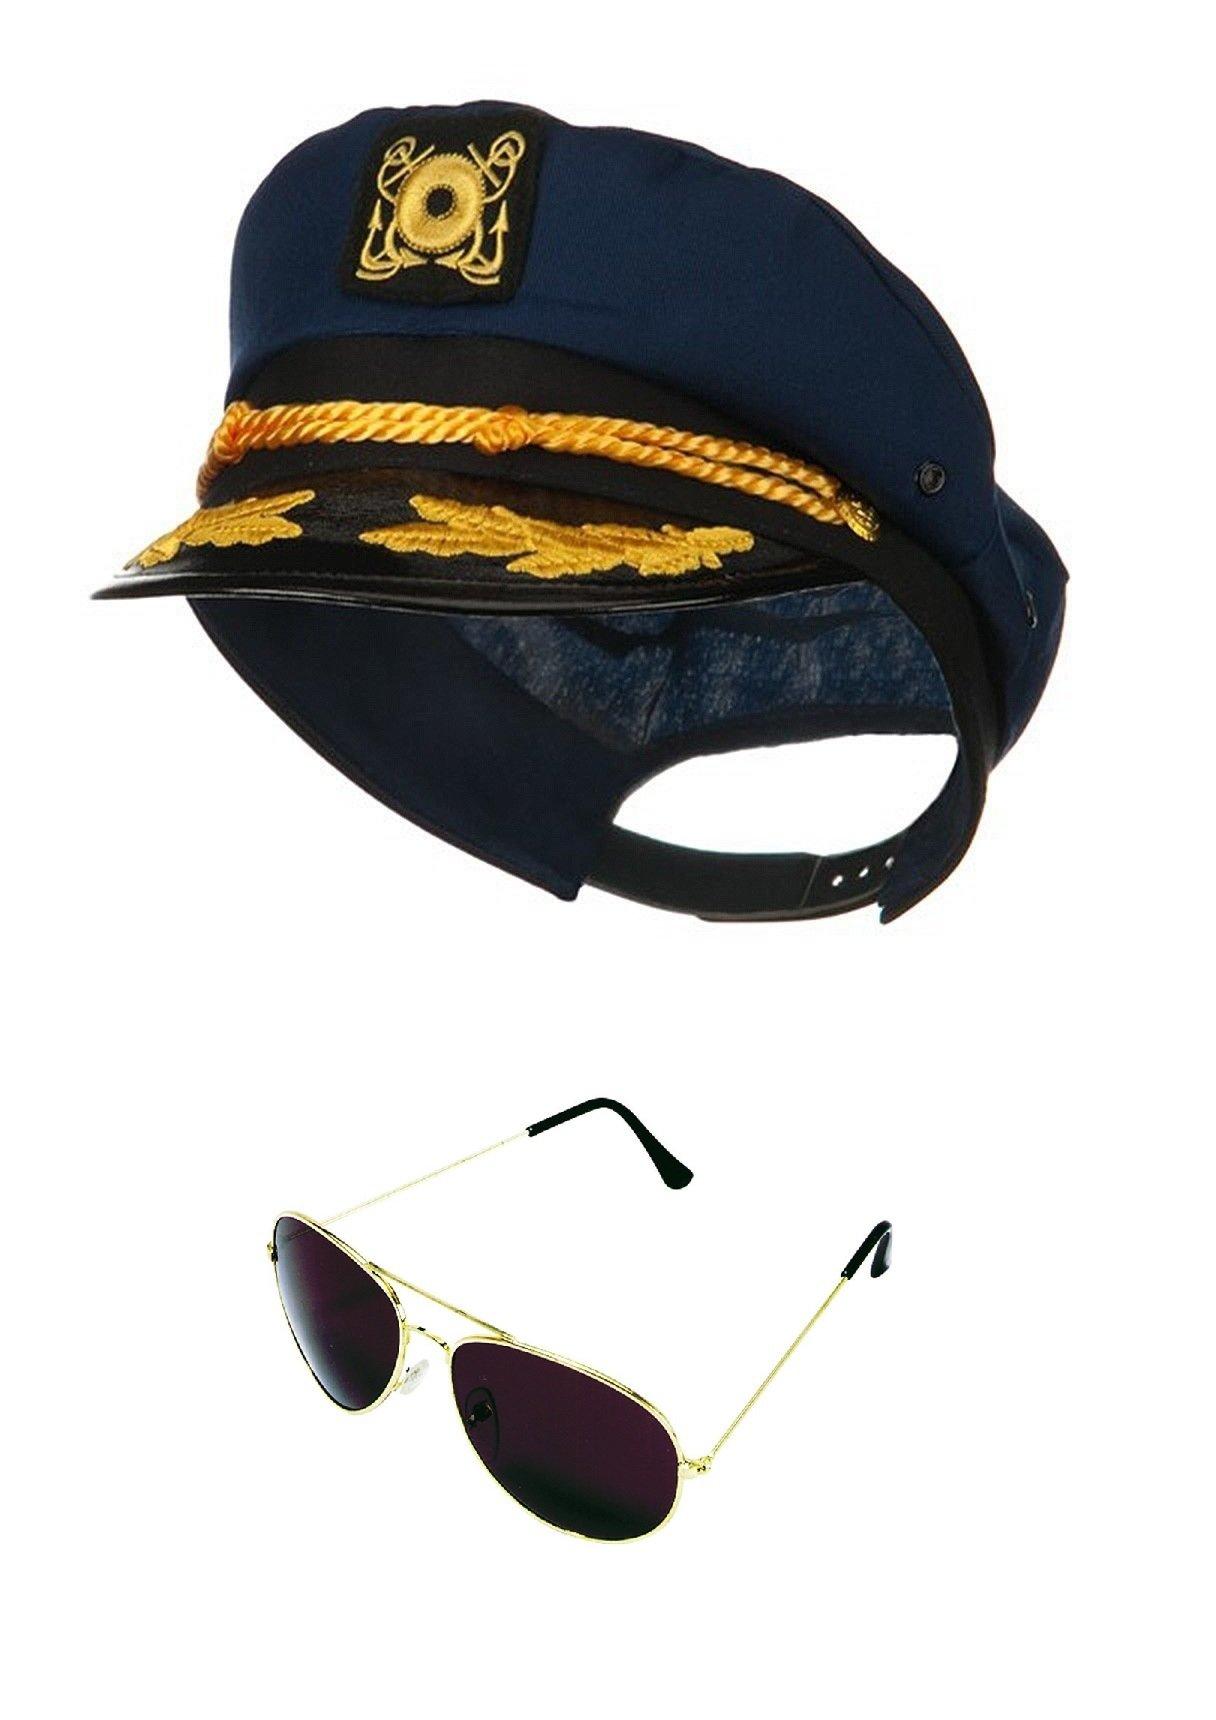 Yacht Skipper Boat Captain Hat Sailor Ship Cap Navy Blue Gold Aviator Sunglasses by Nicky Bigs Novelties (Image #1)